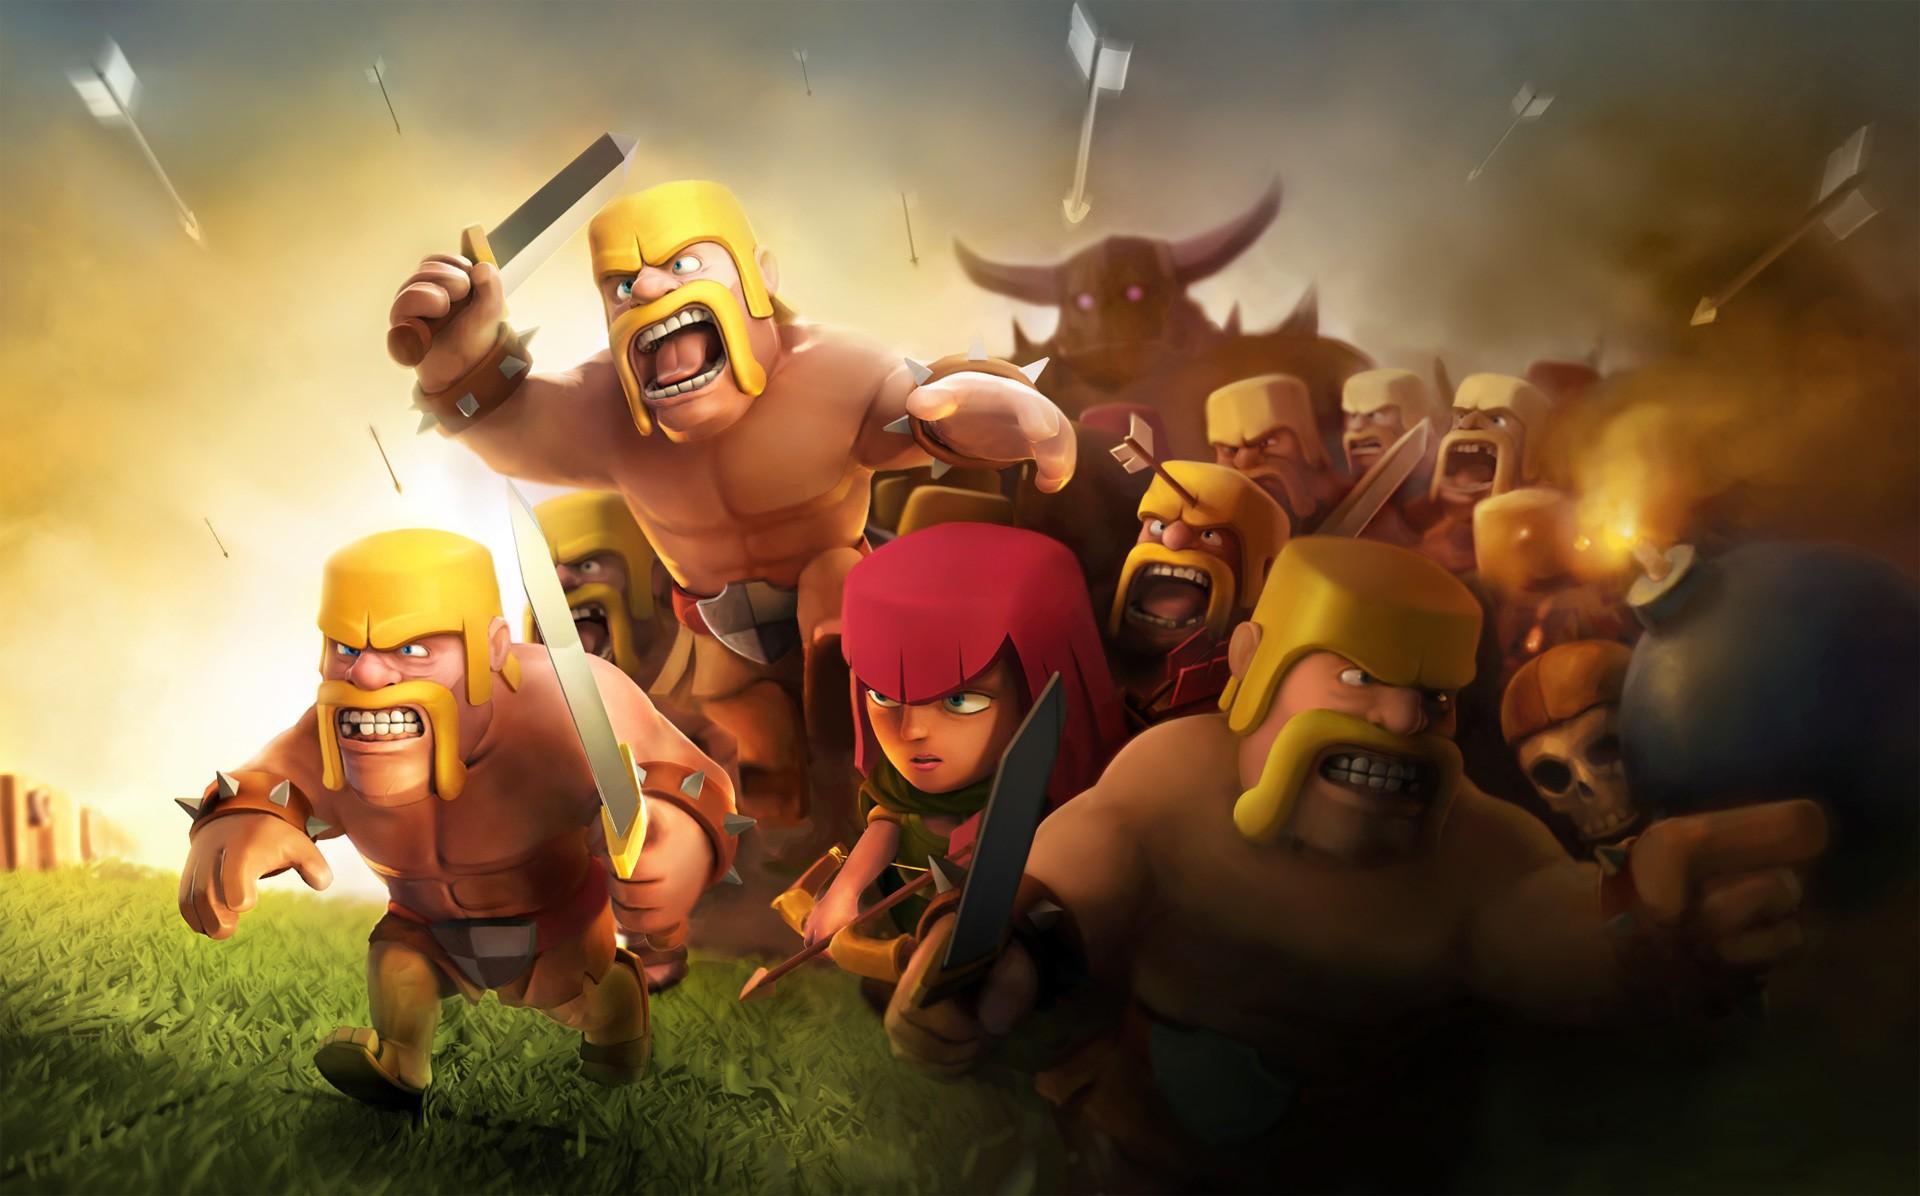 Clash Of Clans Wallpapers WeNeedFun 1920x1196